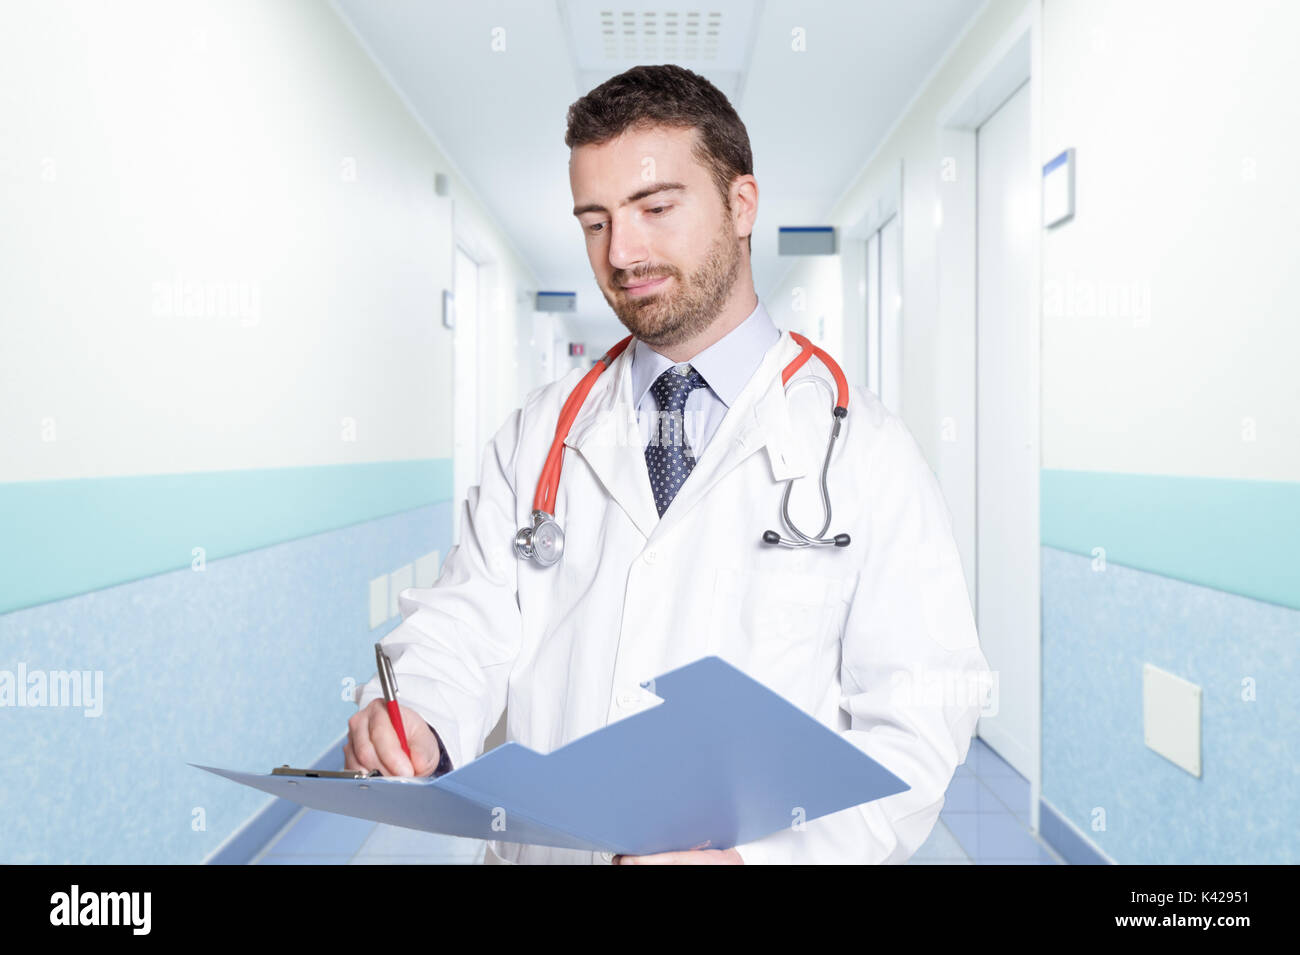 Doctor portrait on hospital corridor background - Stock Image